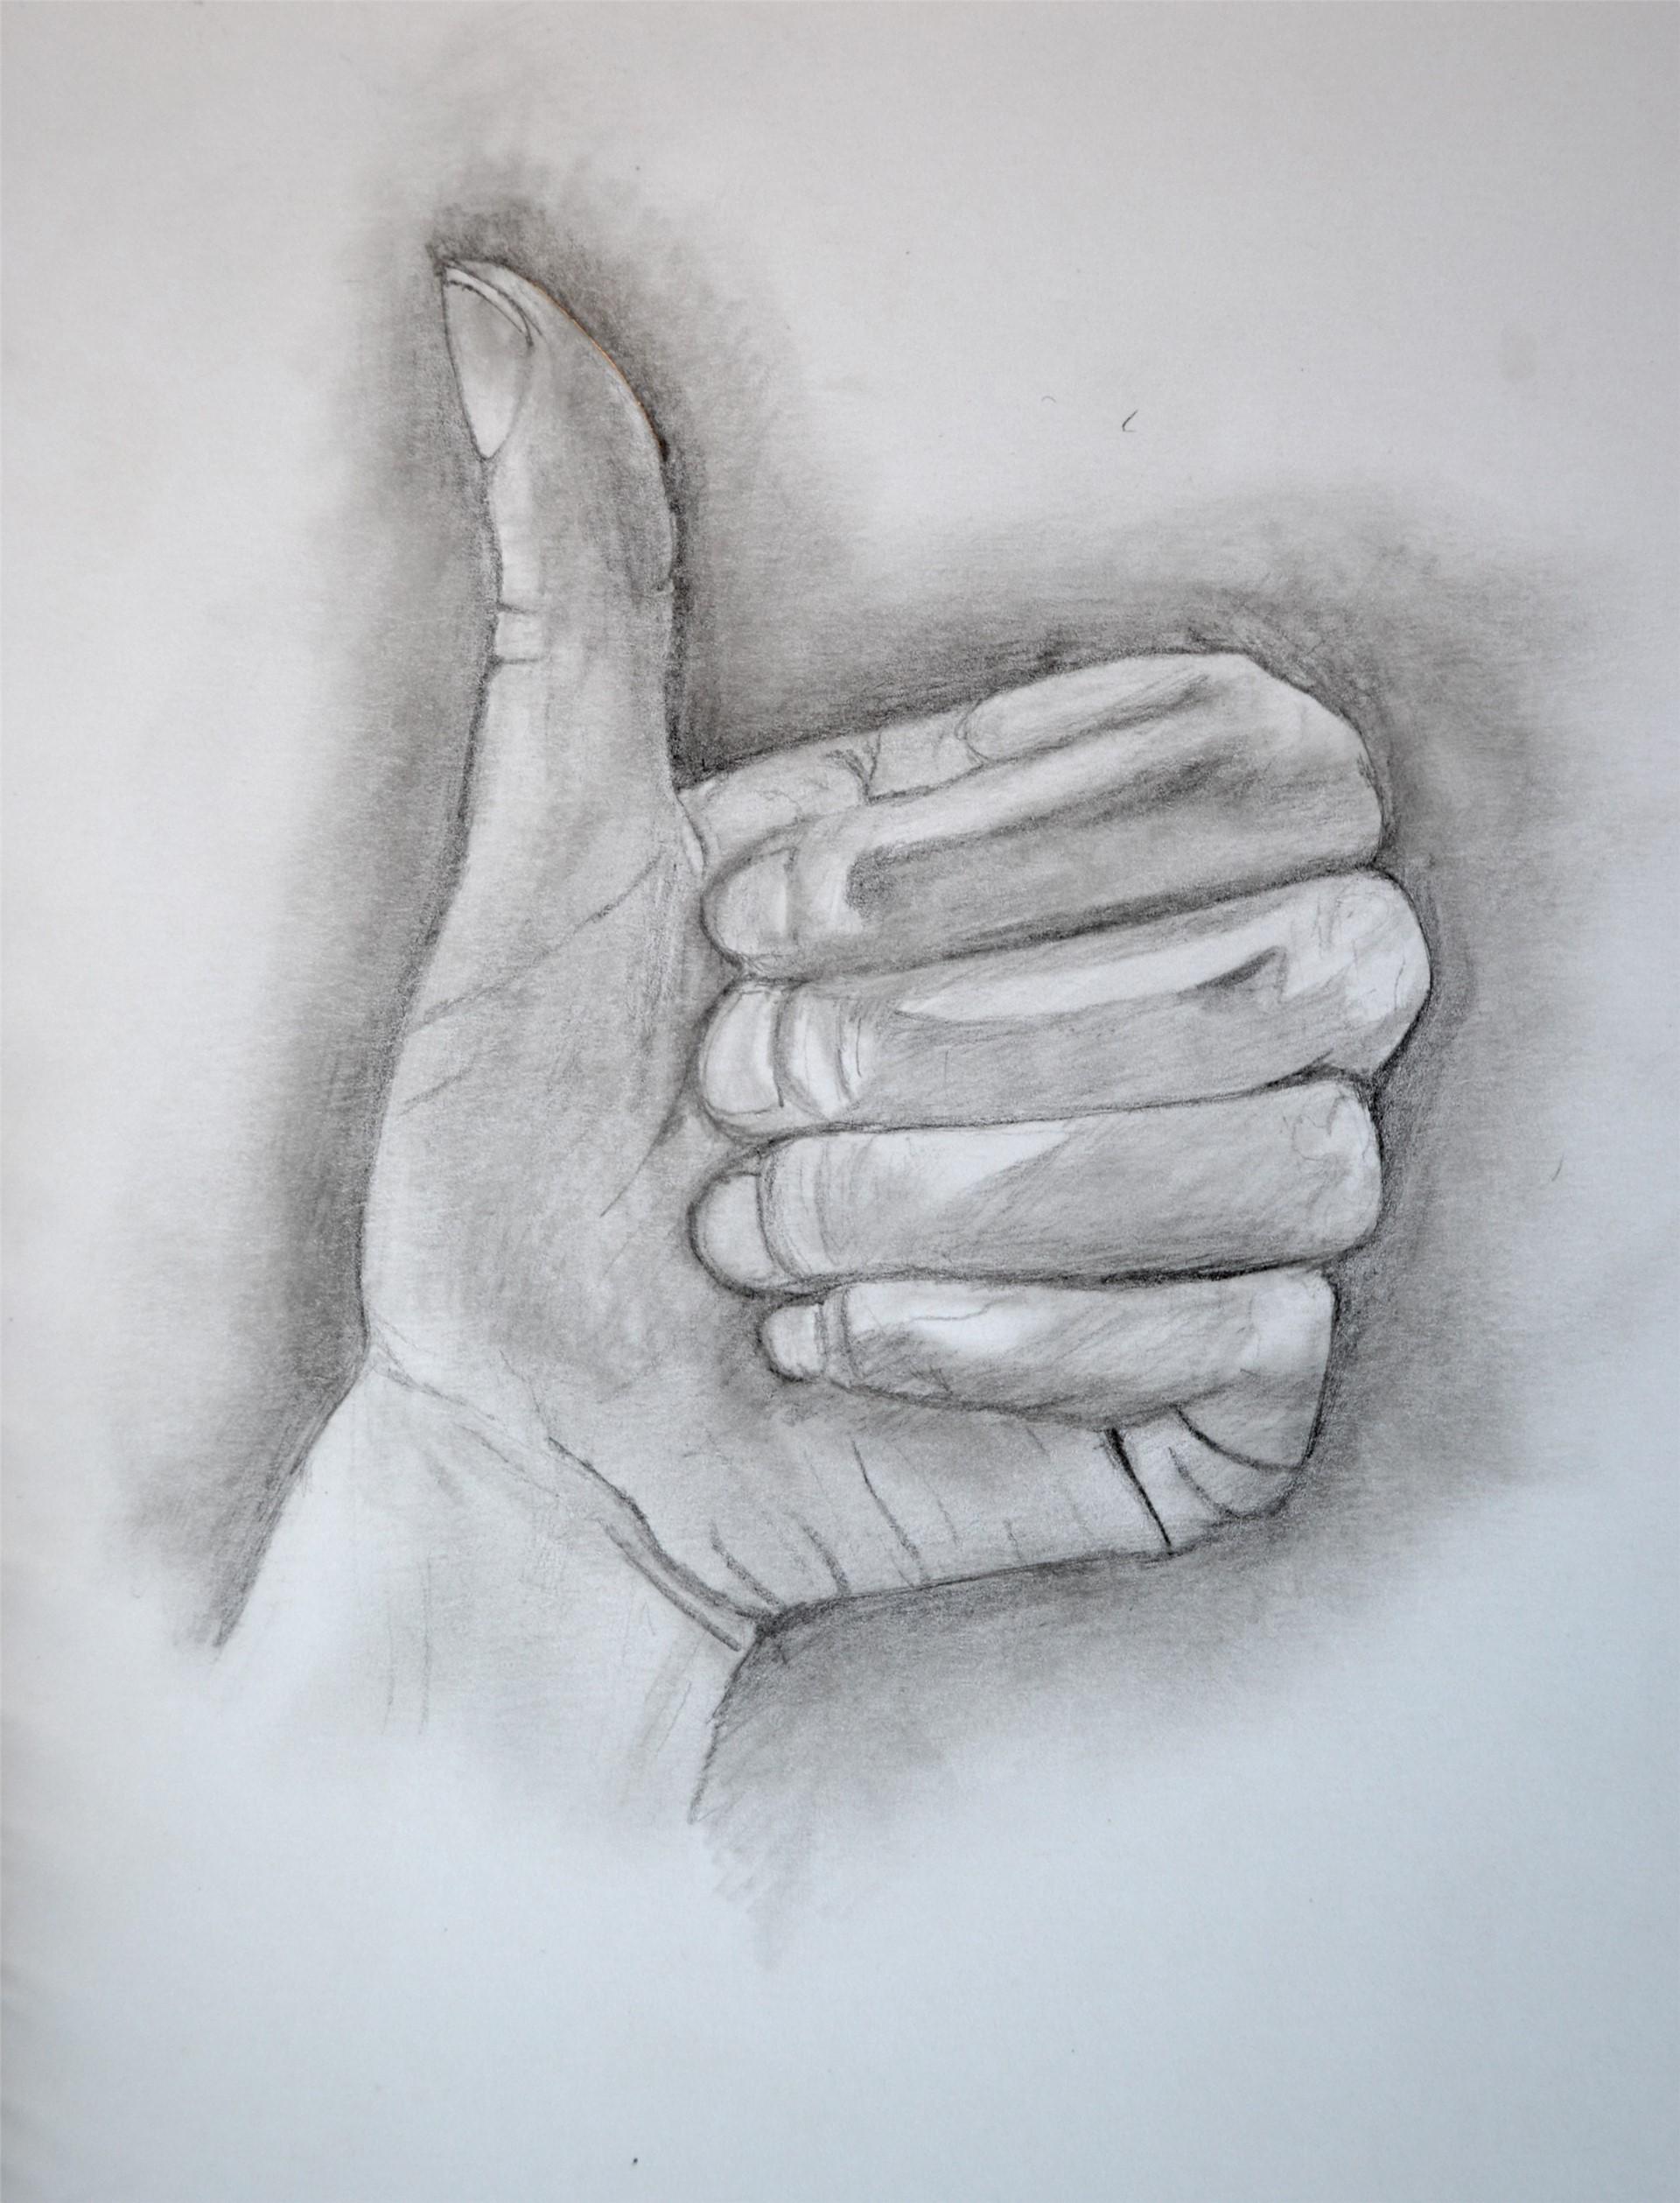 CORY NORDBERG, Prelinary Hand Drawing, graphite, 12 x 9, 2015